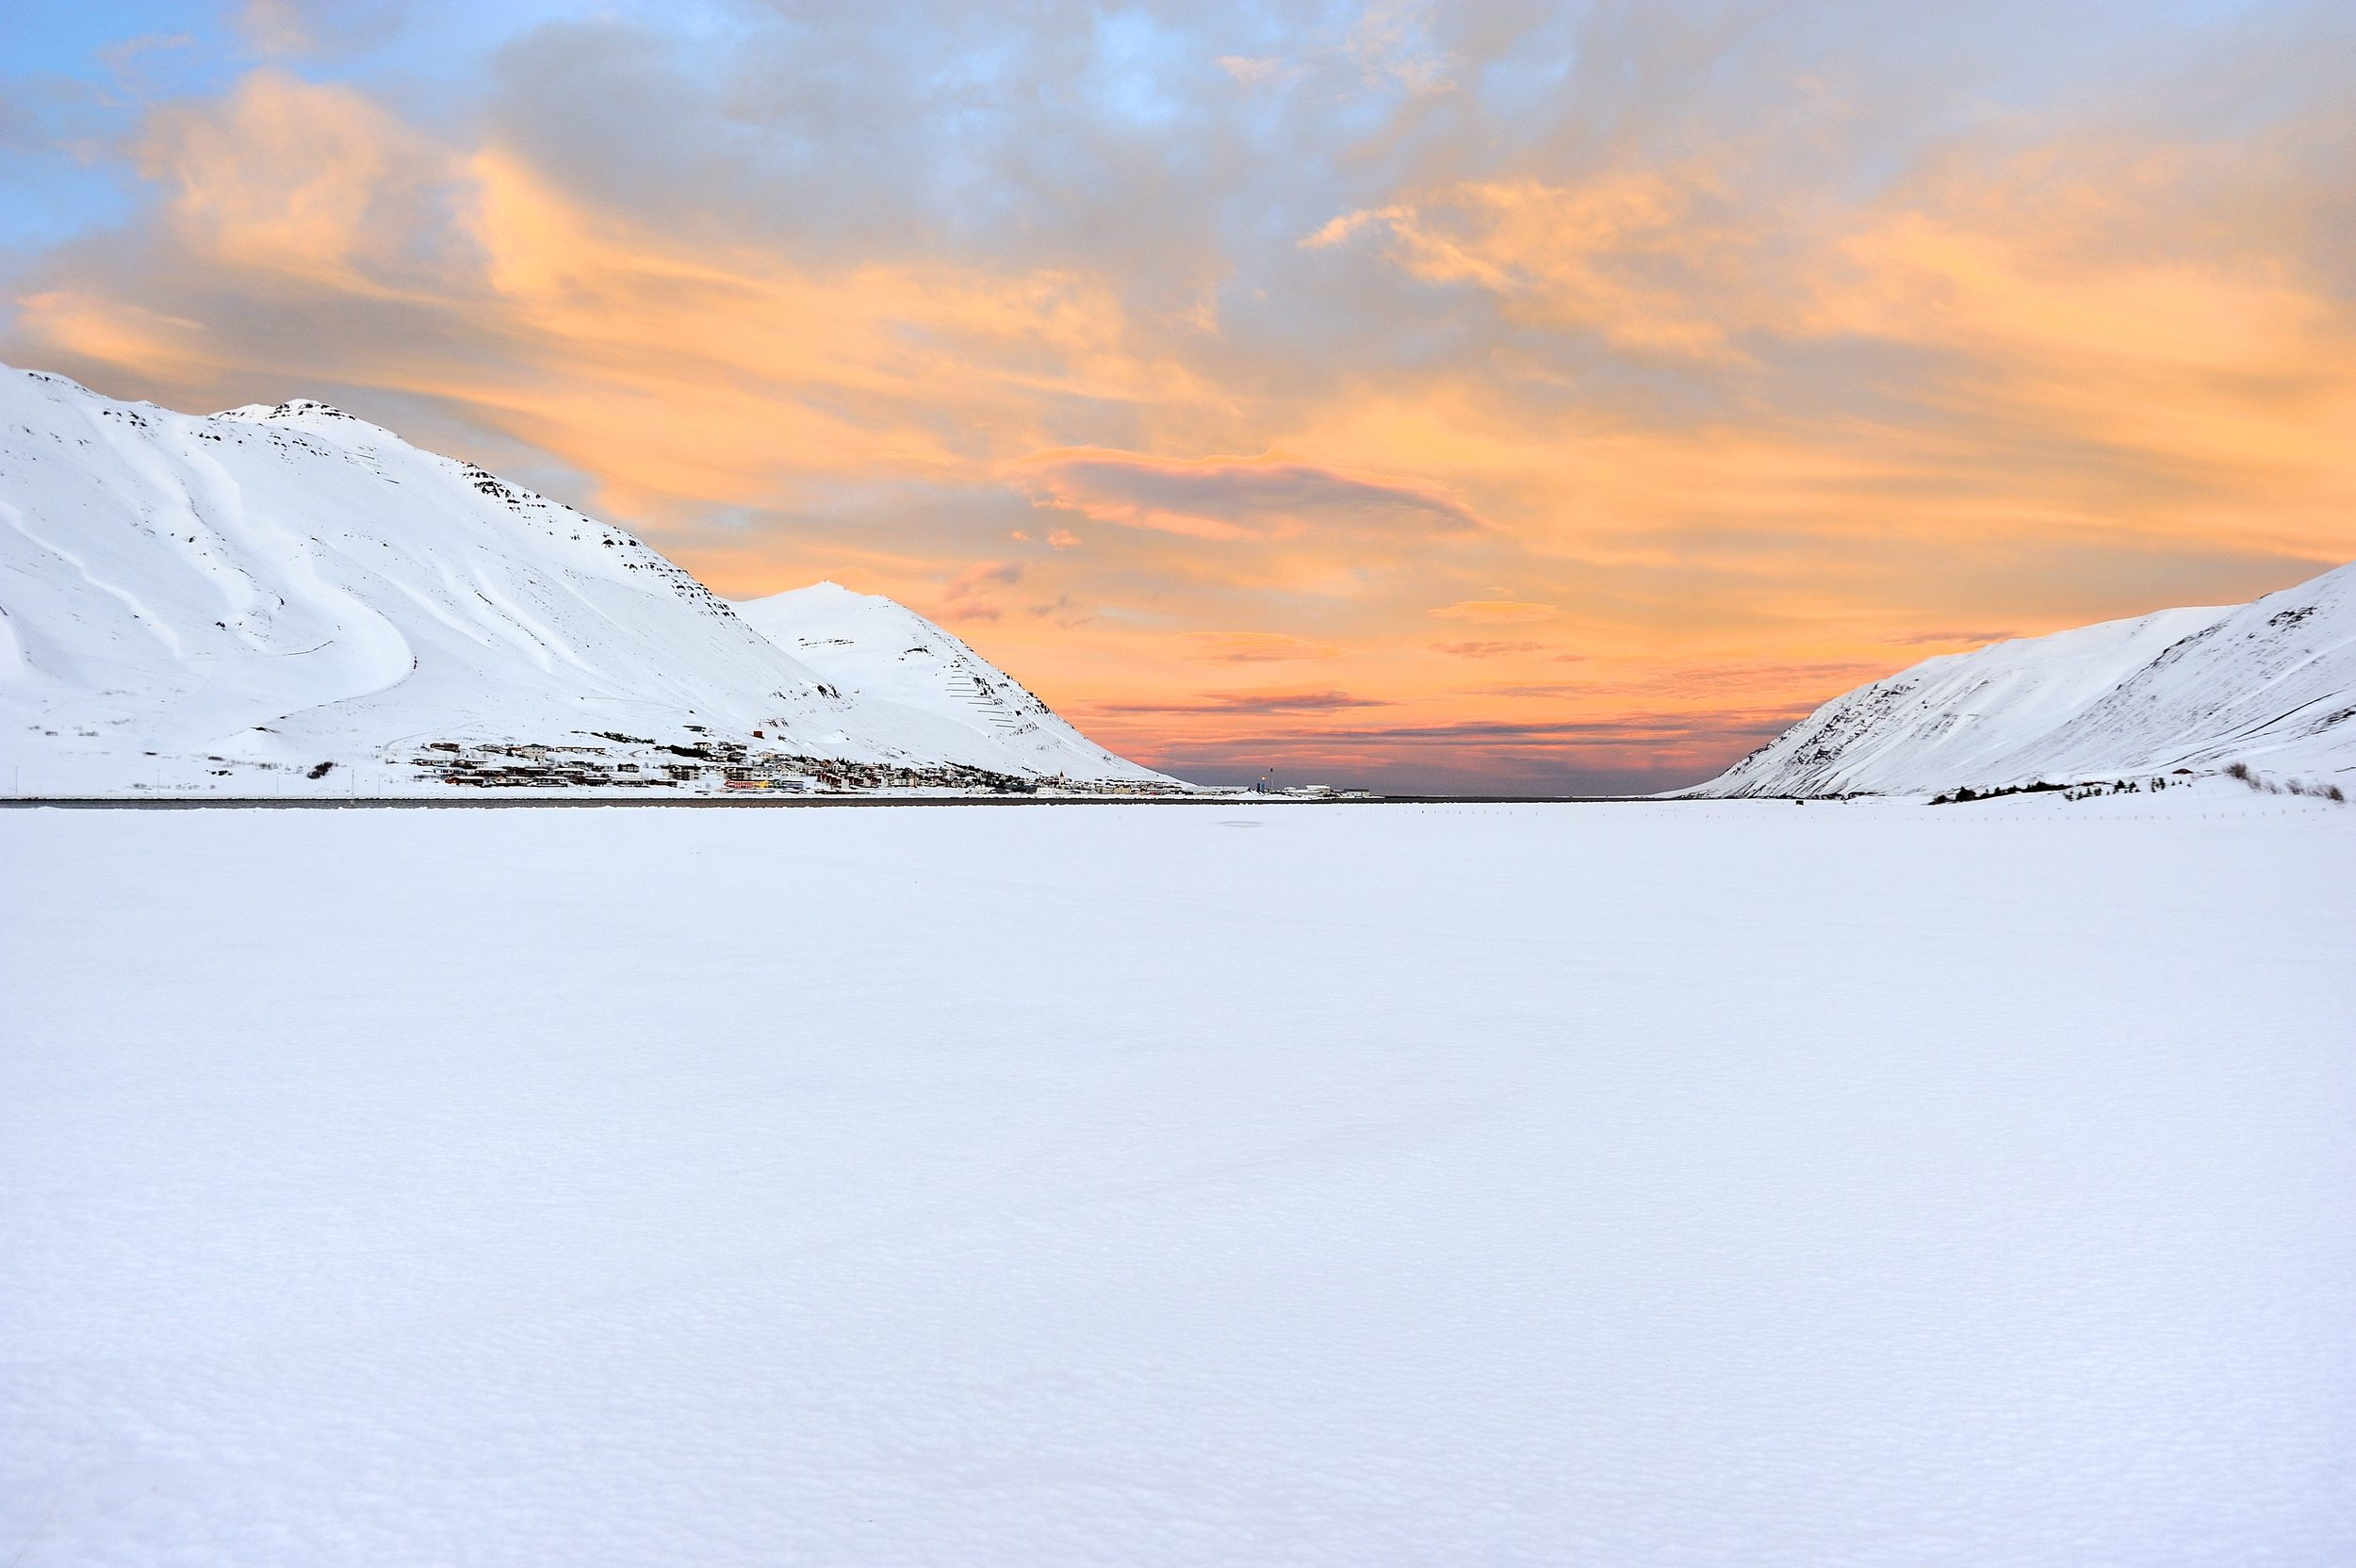 The town of Siglufjordur in Iceland. Photo © Sigurður Ægisson